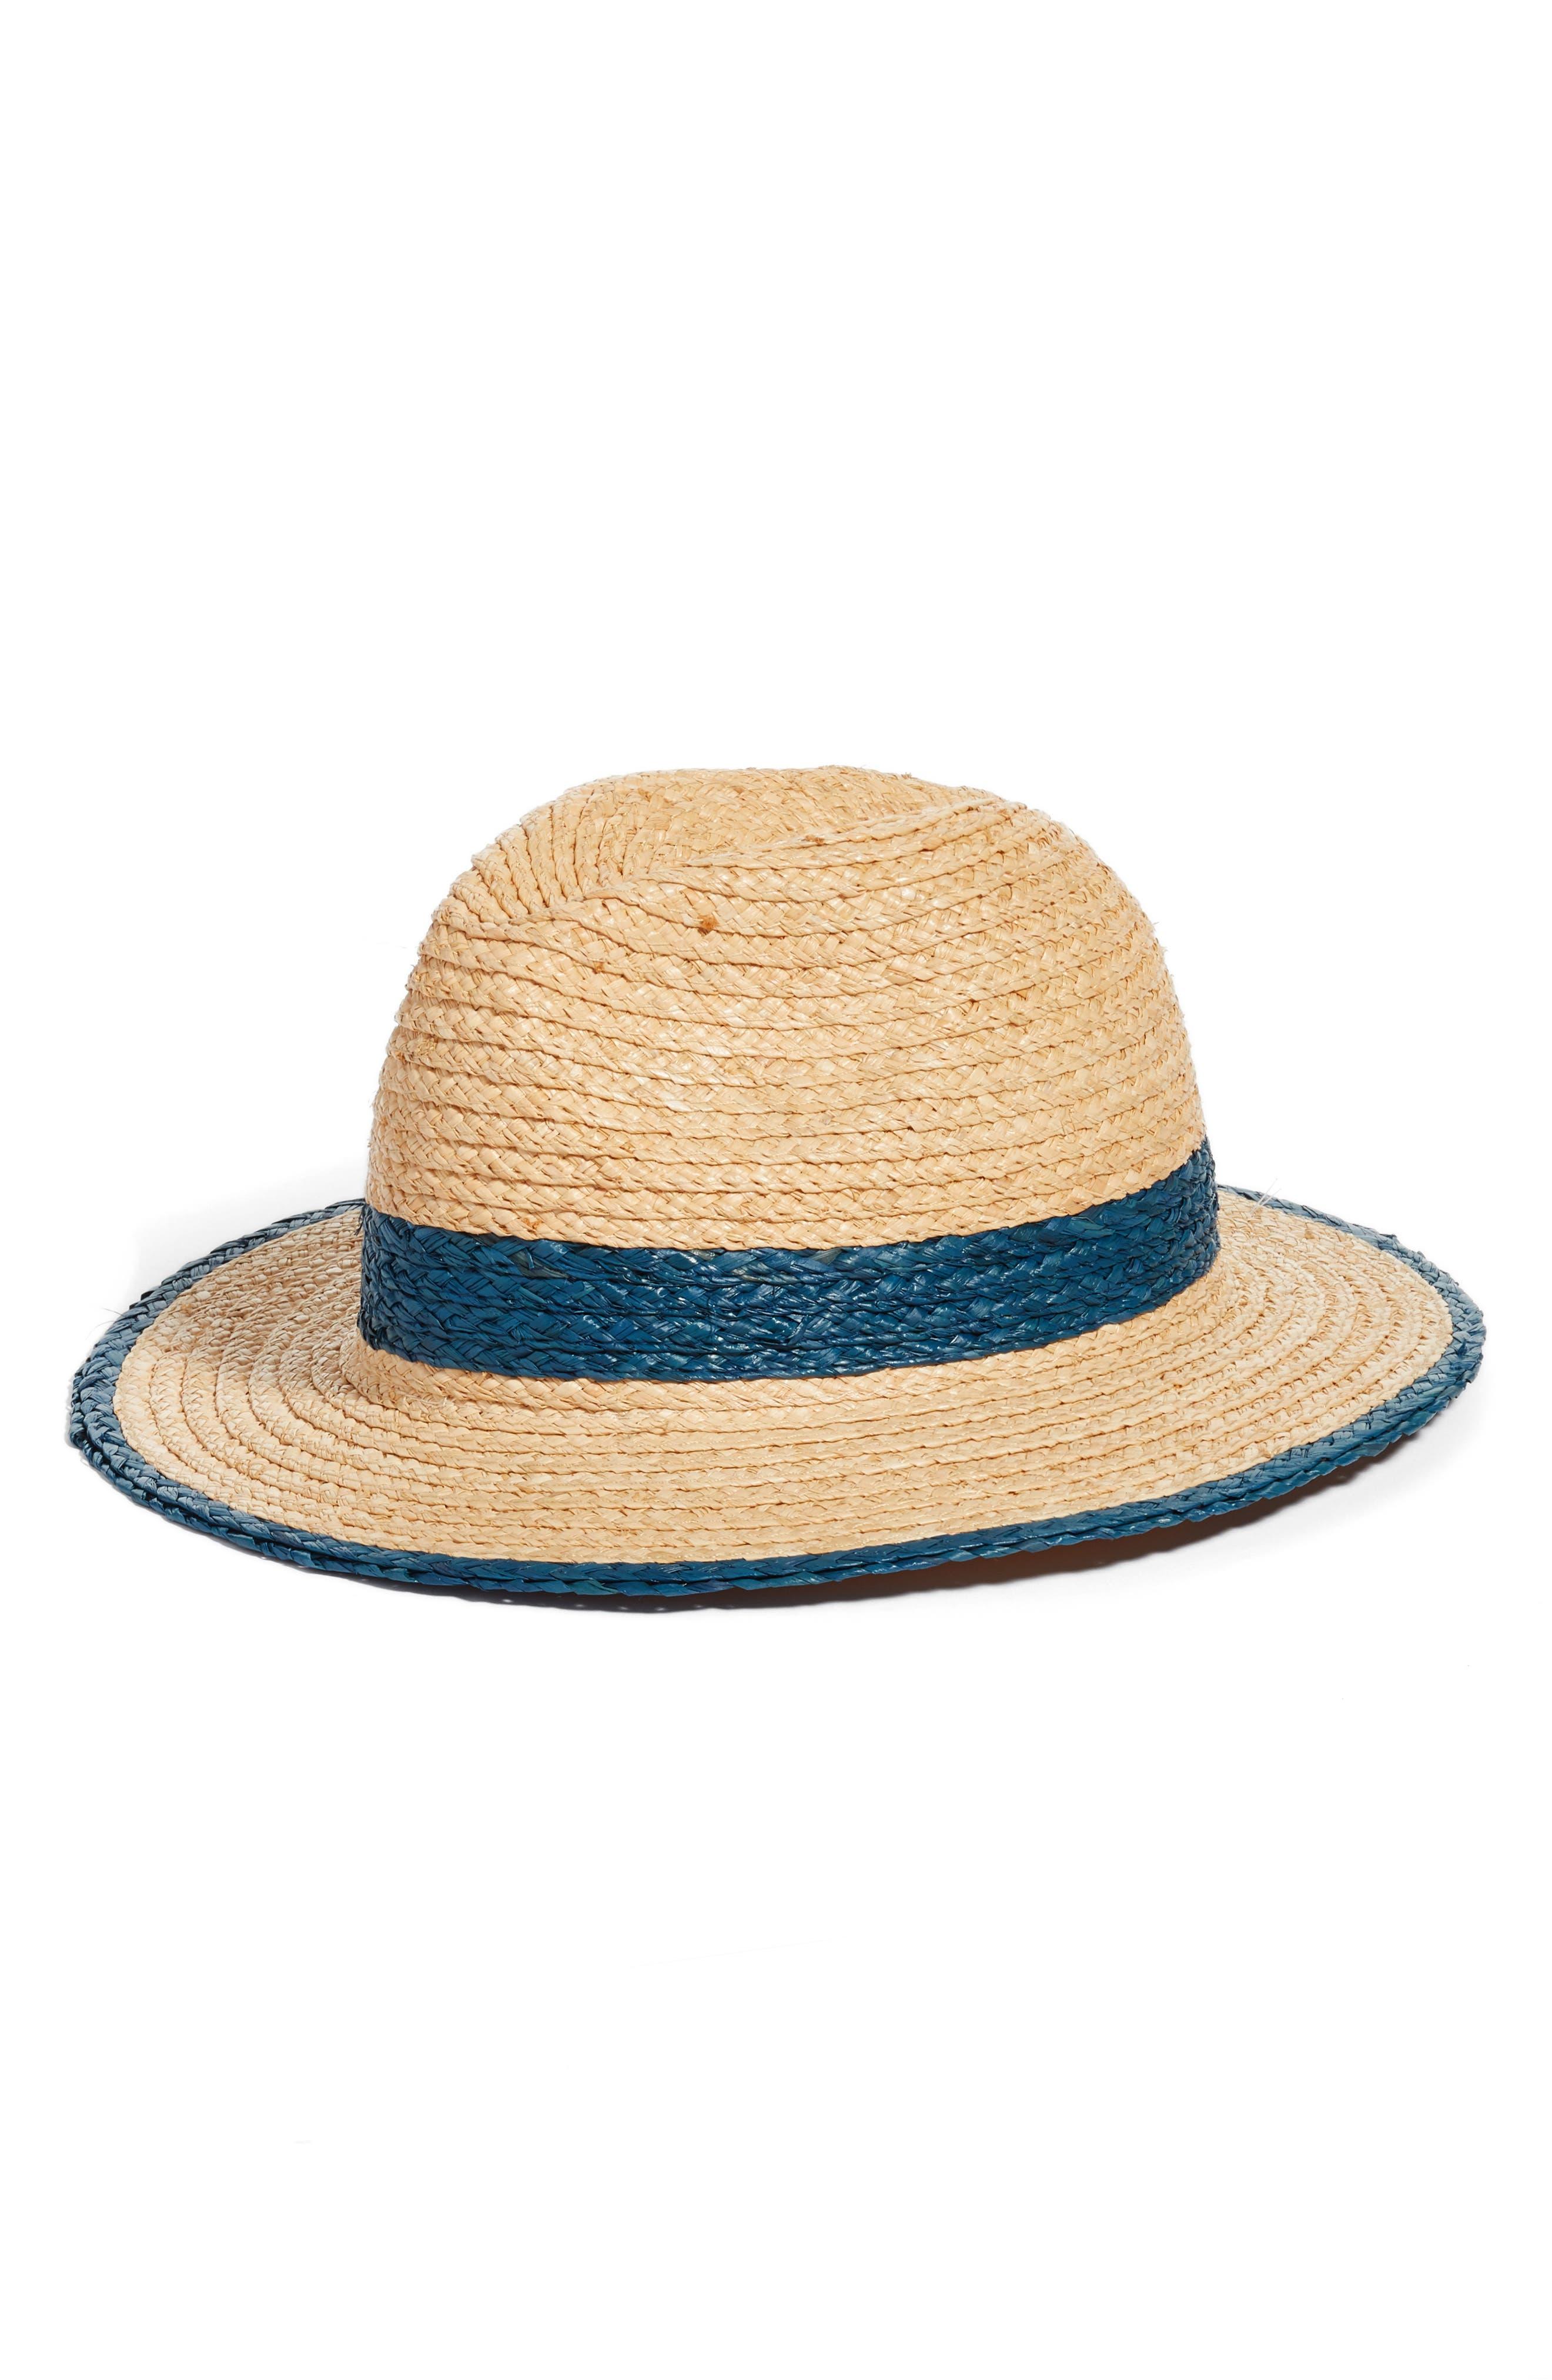 Contrast Trim Straw Panama Hat,                             Main thumbnail 1, color,                             260